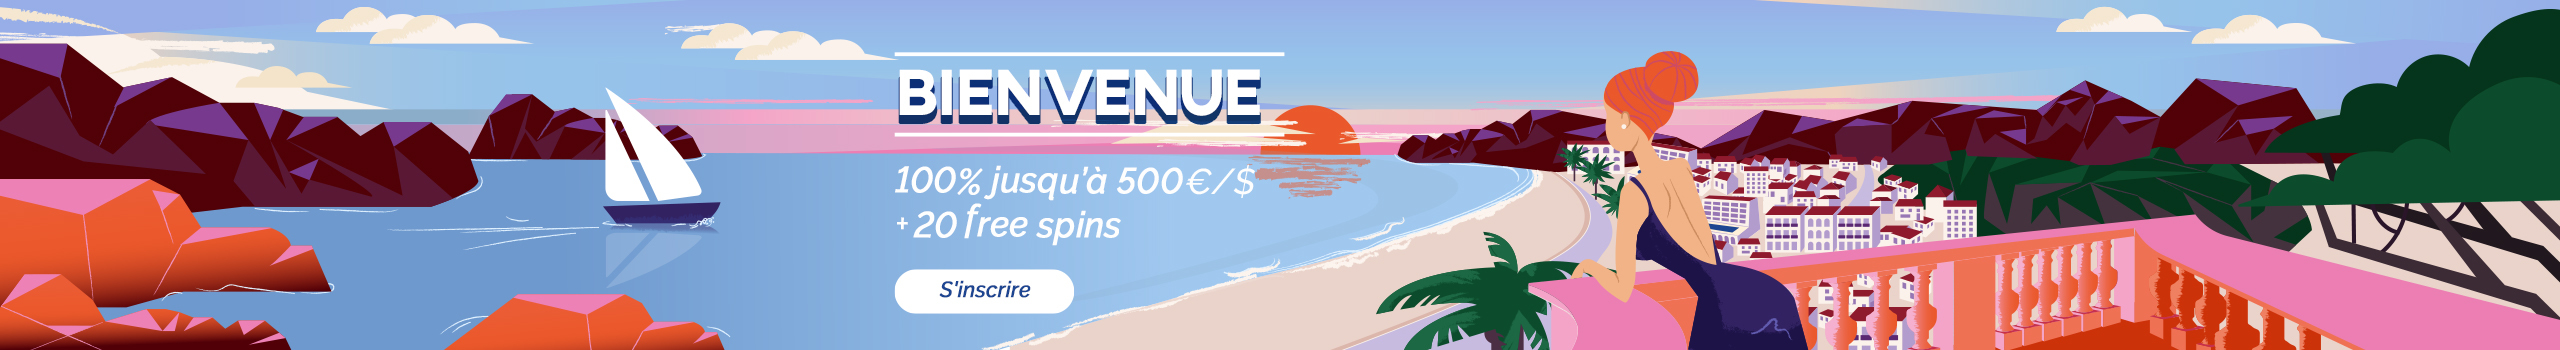 Azur Casino bonus de bienvenue